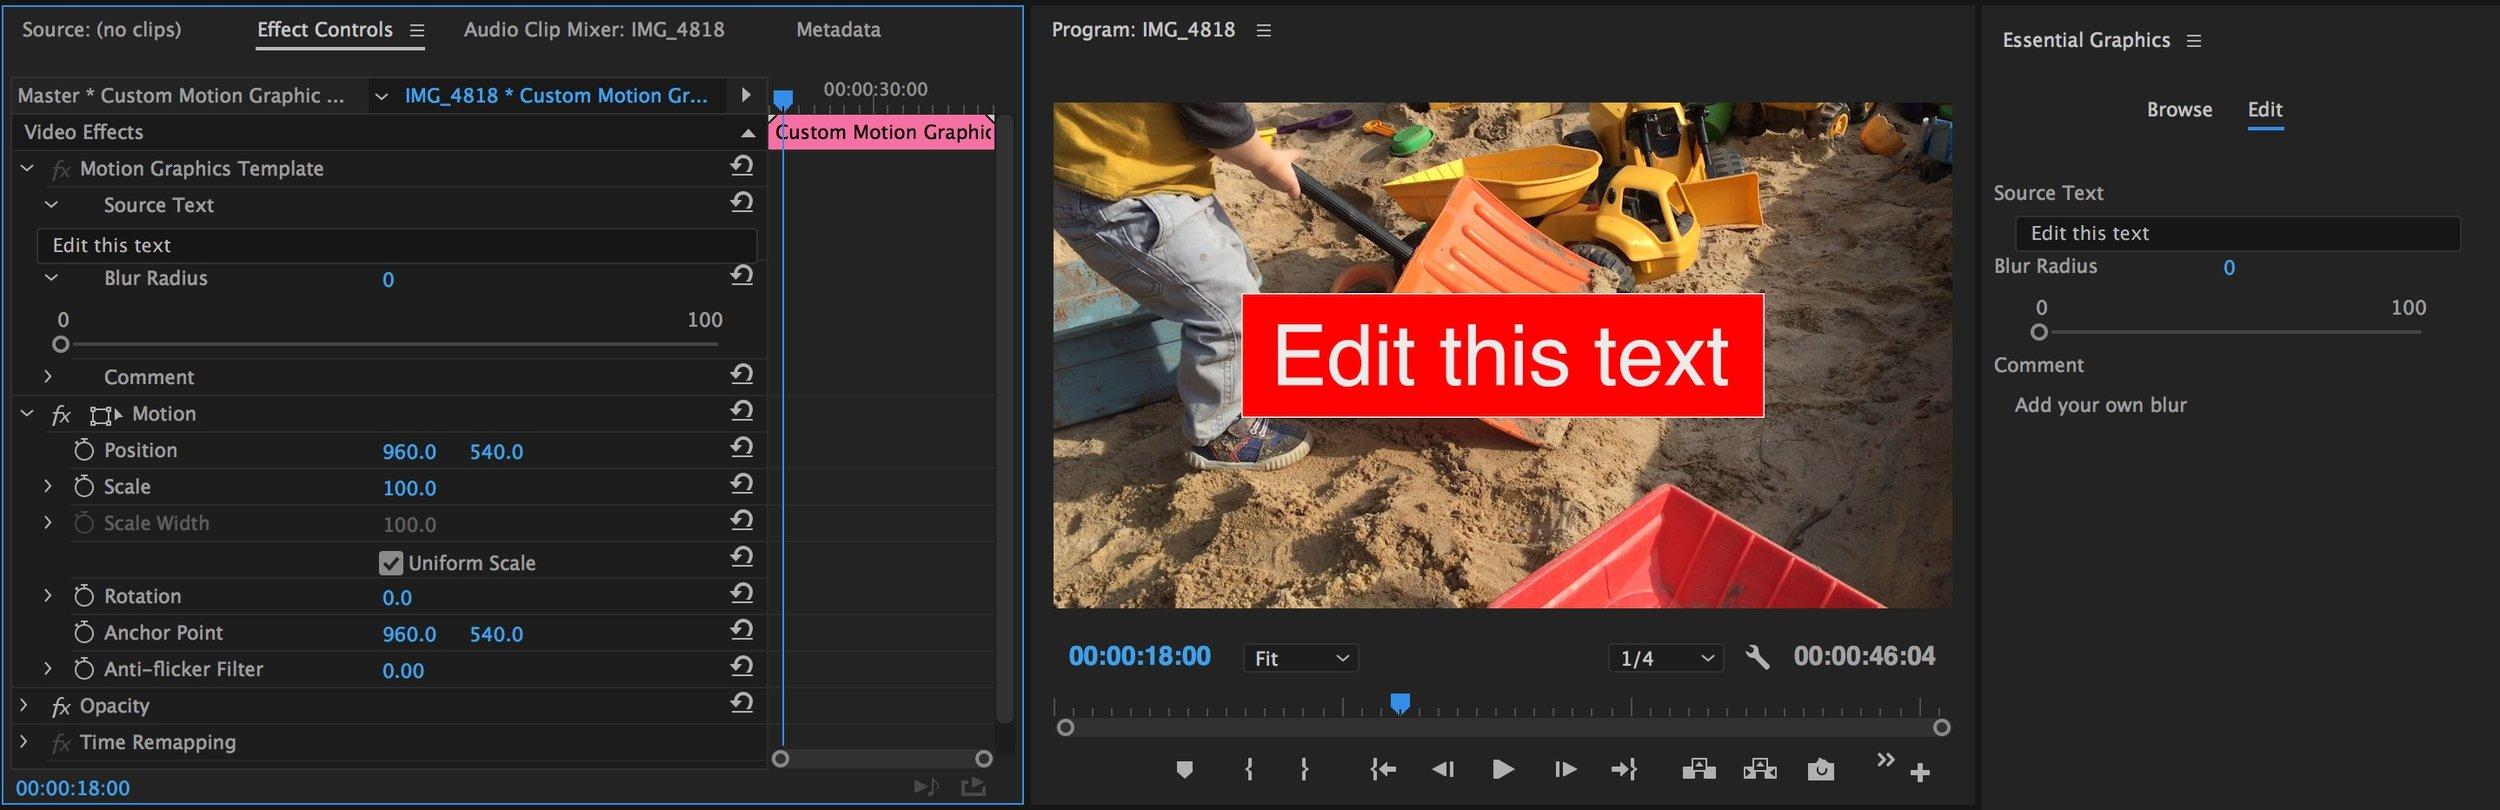 Edit Motion Graphics Templates in Premiere Pro